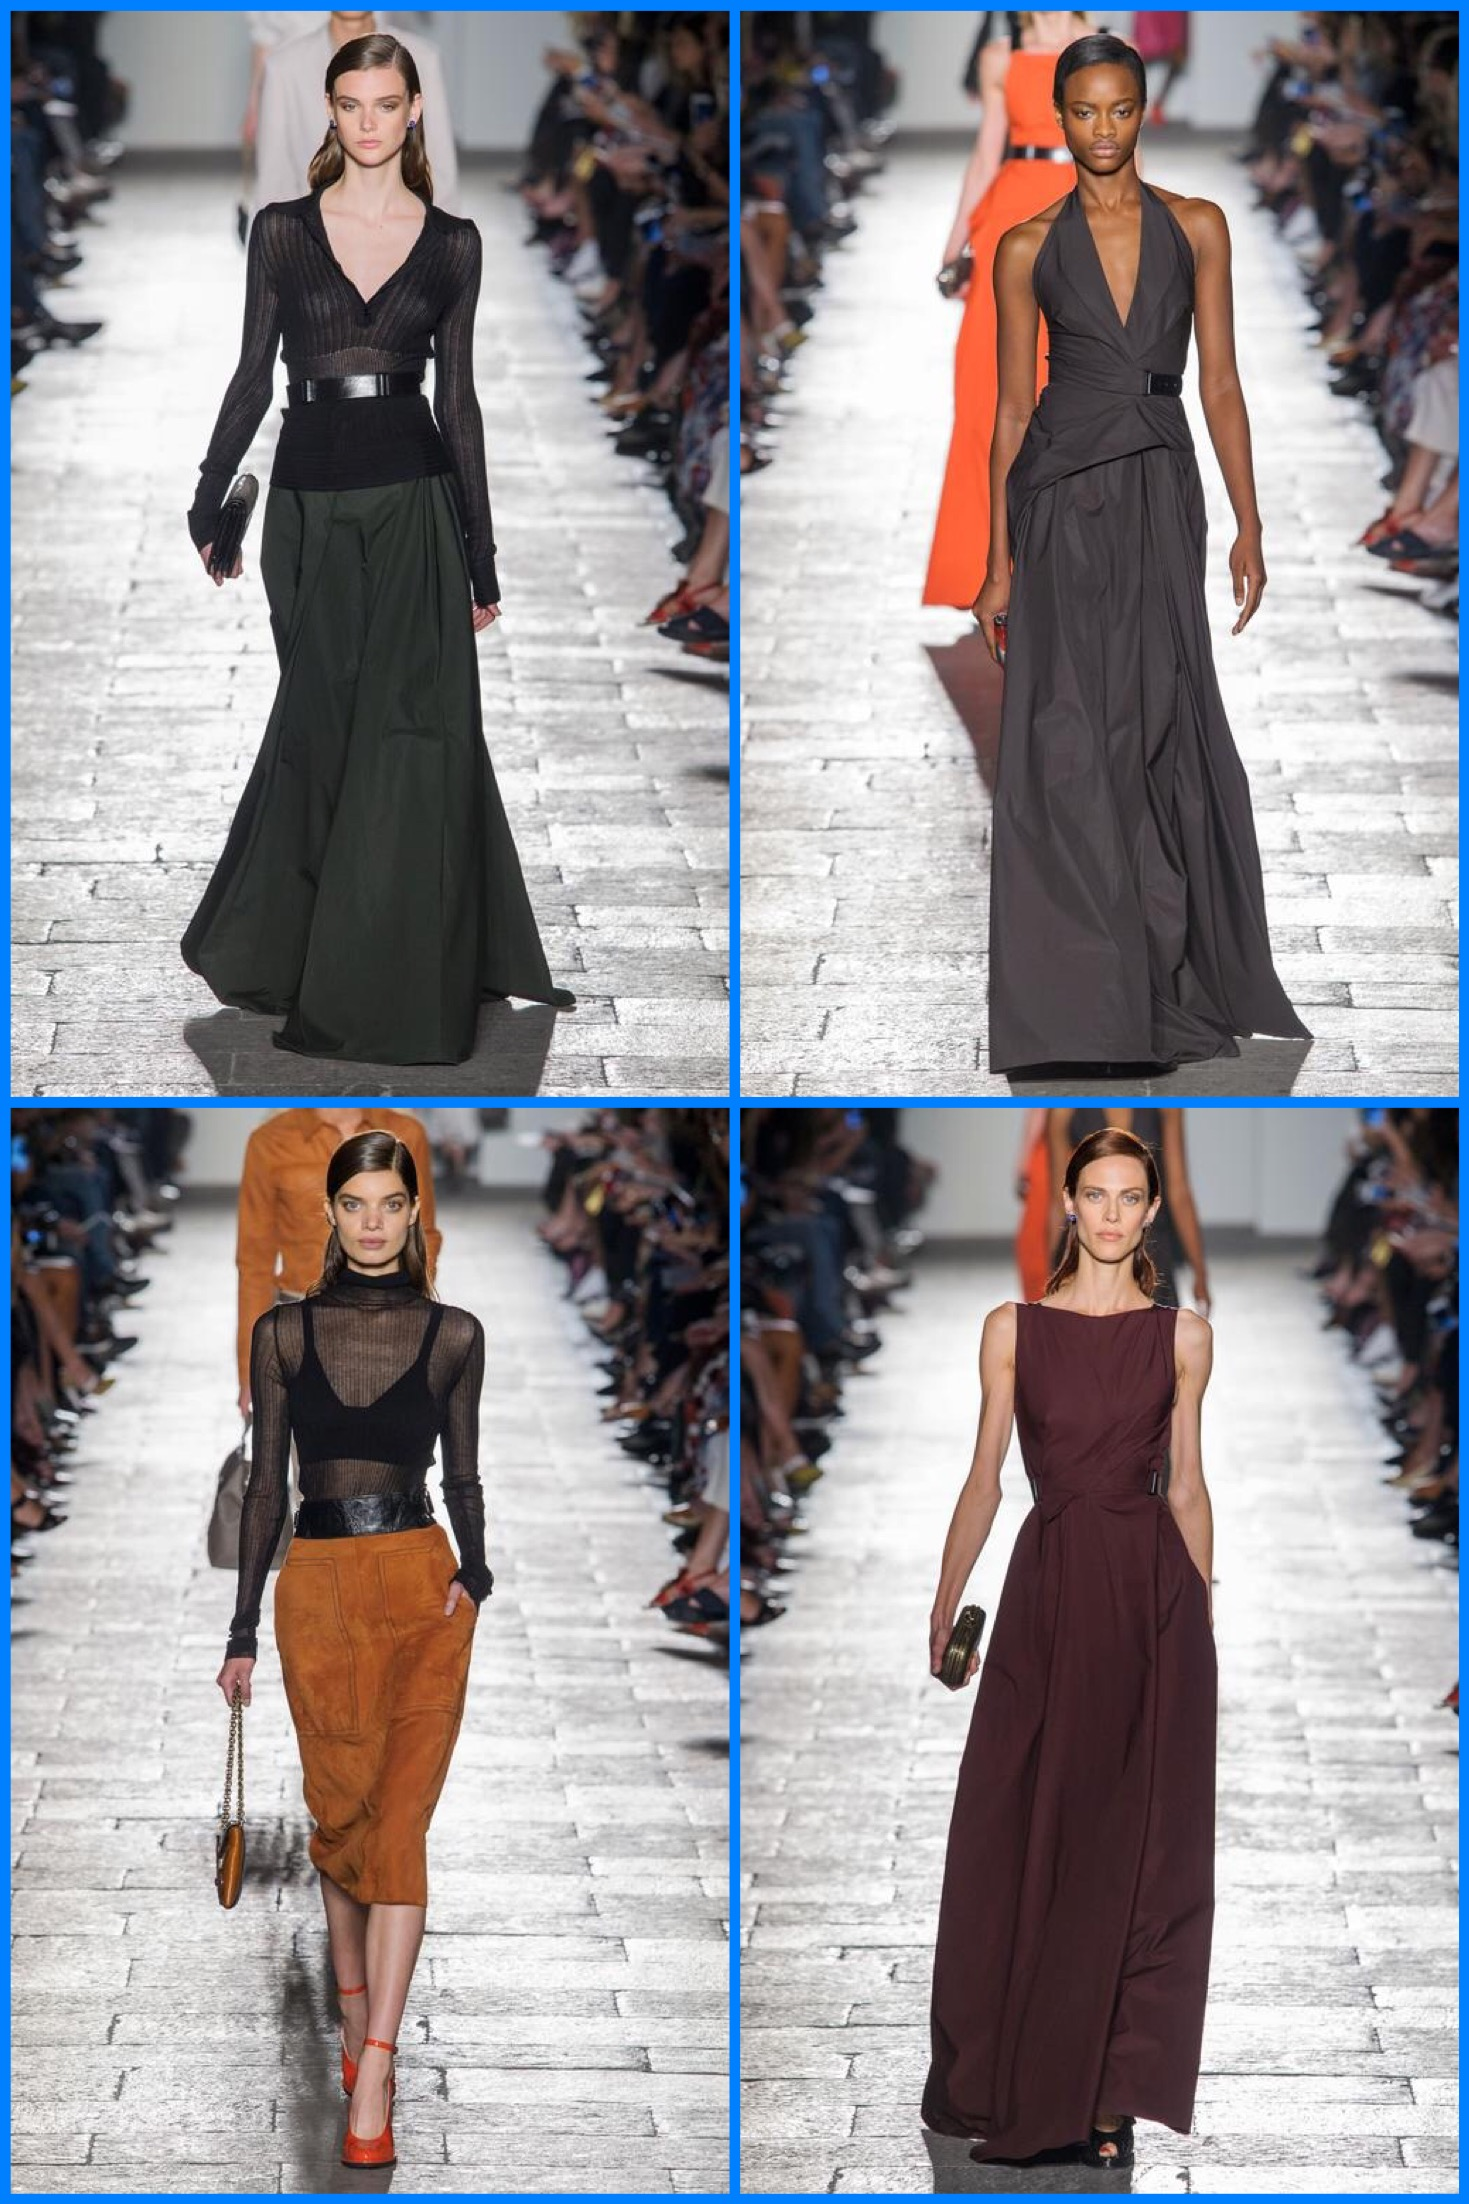 milano-fashion-week-pret-a-porter-spring-summer-2017-style-bottega-veneta